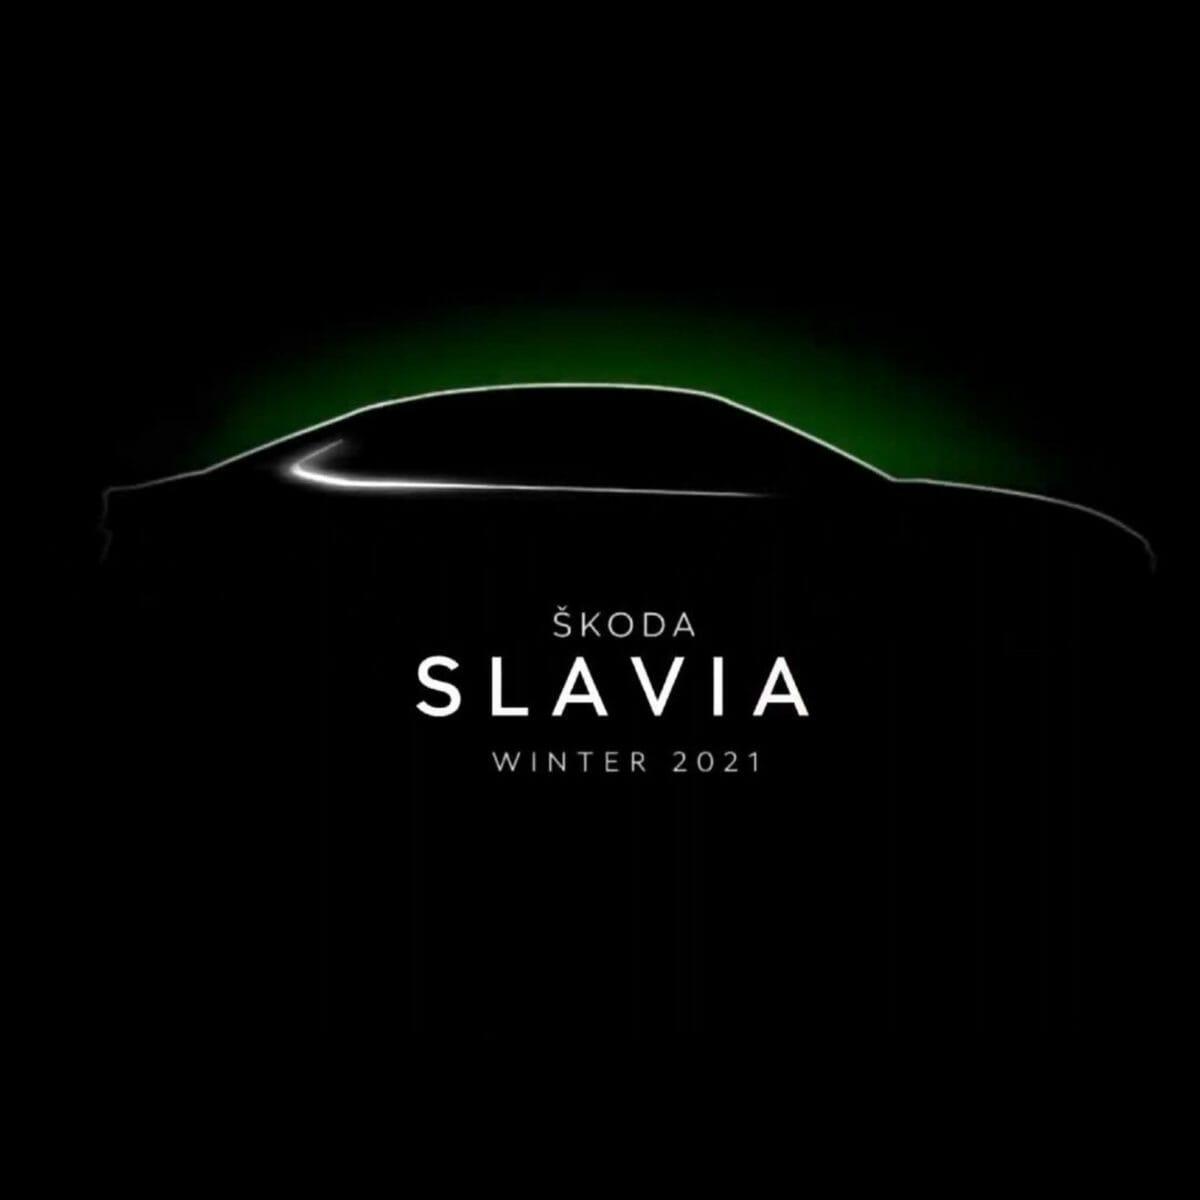 Skoda Slavia teased